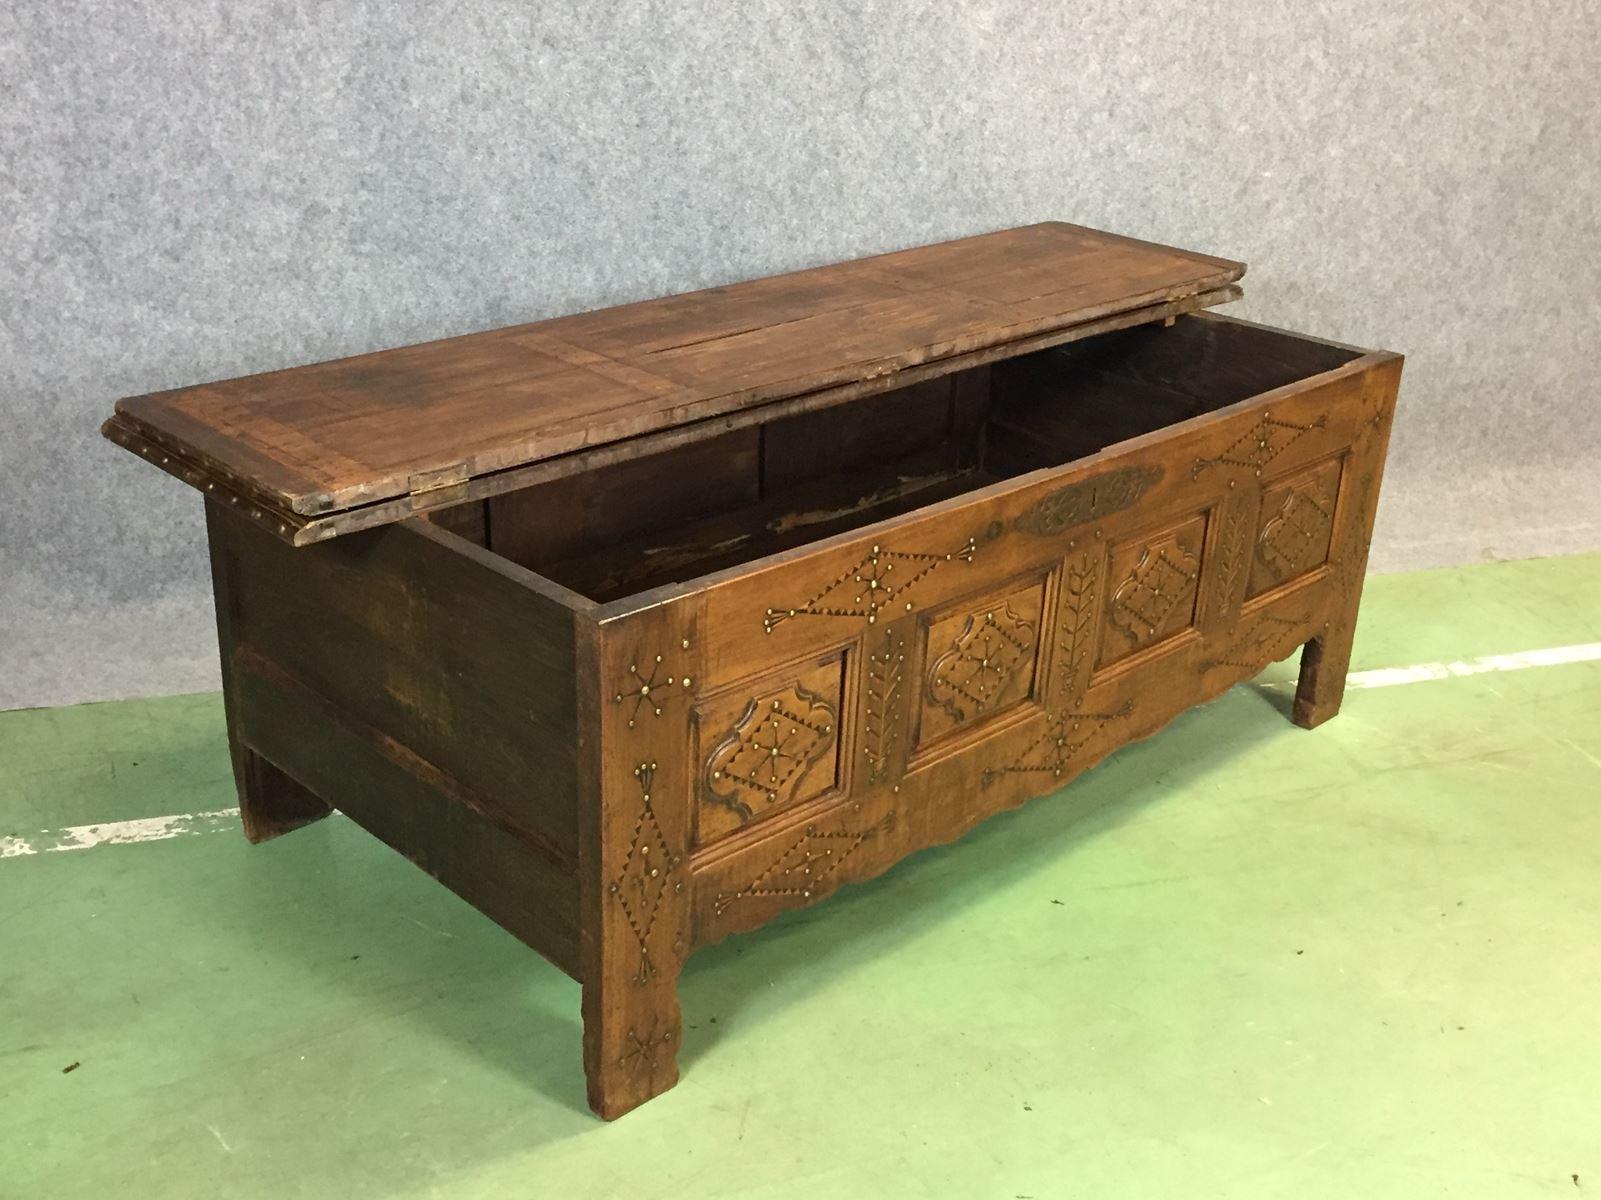 kirschholz truhe sitzbank 19 jh bei pamono kaufen. Black Bedroom Furniture Sets. Home Design Ideas